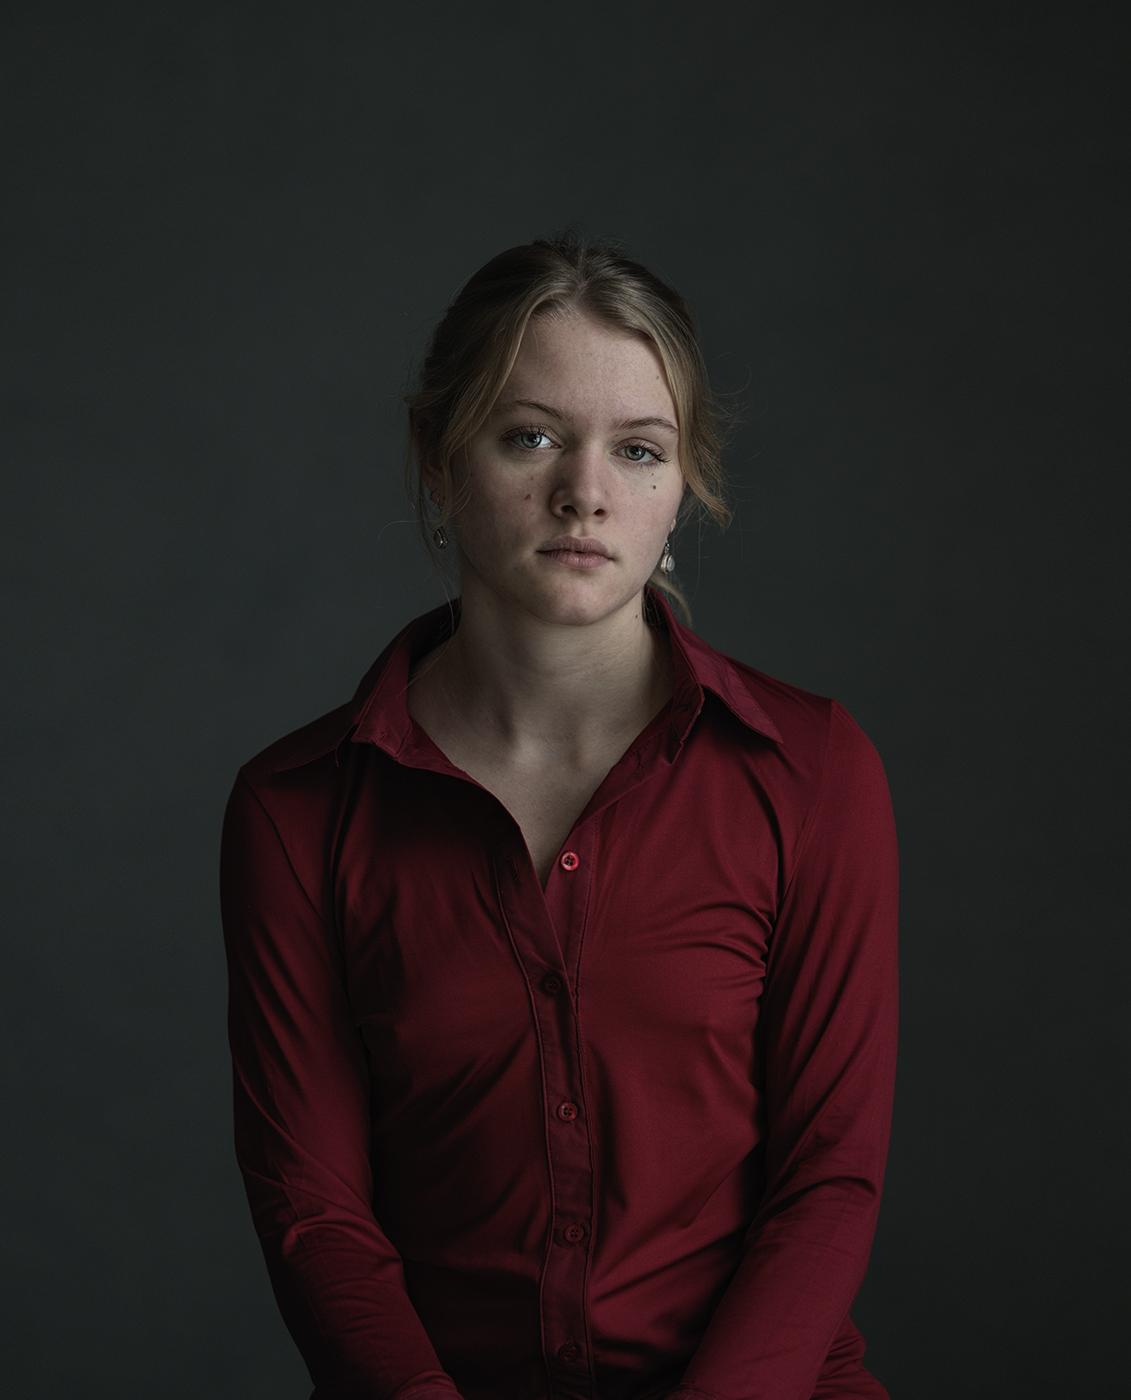 portrait of Brechje, portret, portrait, portretfotografie, portraitphotography, Susanne Middelberg